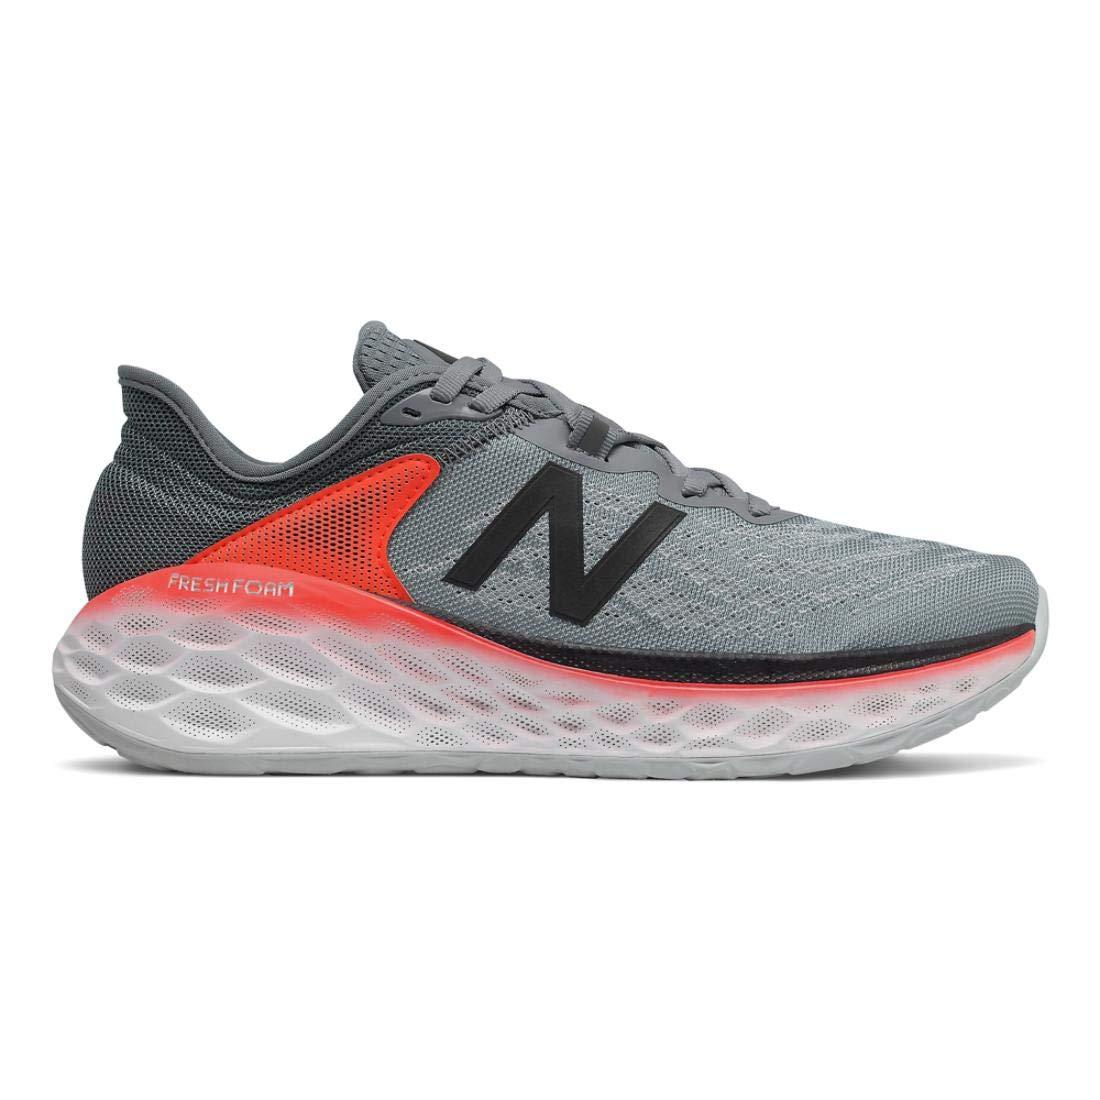 New Balance Fresh Foam More Zapatillas para Correr V2 - AW20-40.5: Amazon.es: Zapatos y complementos